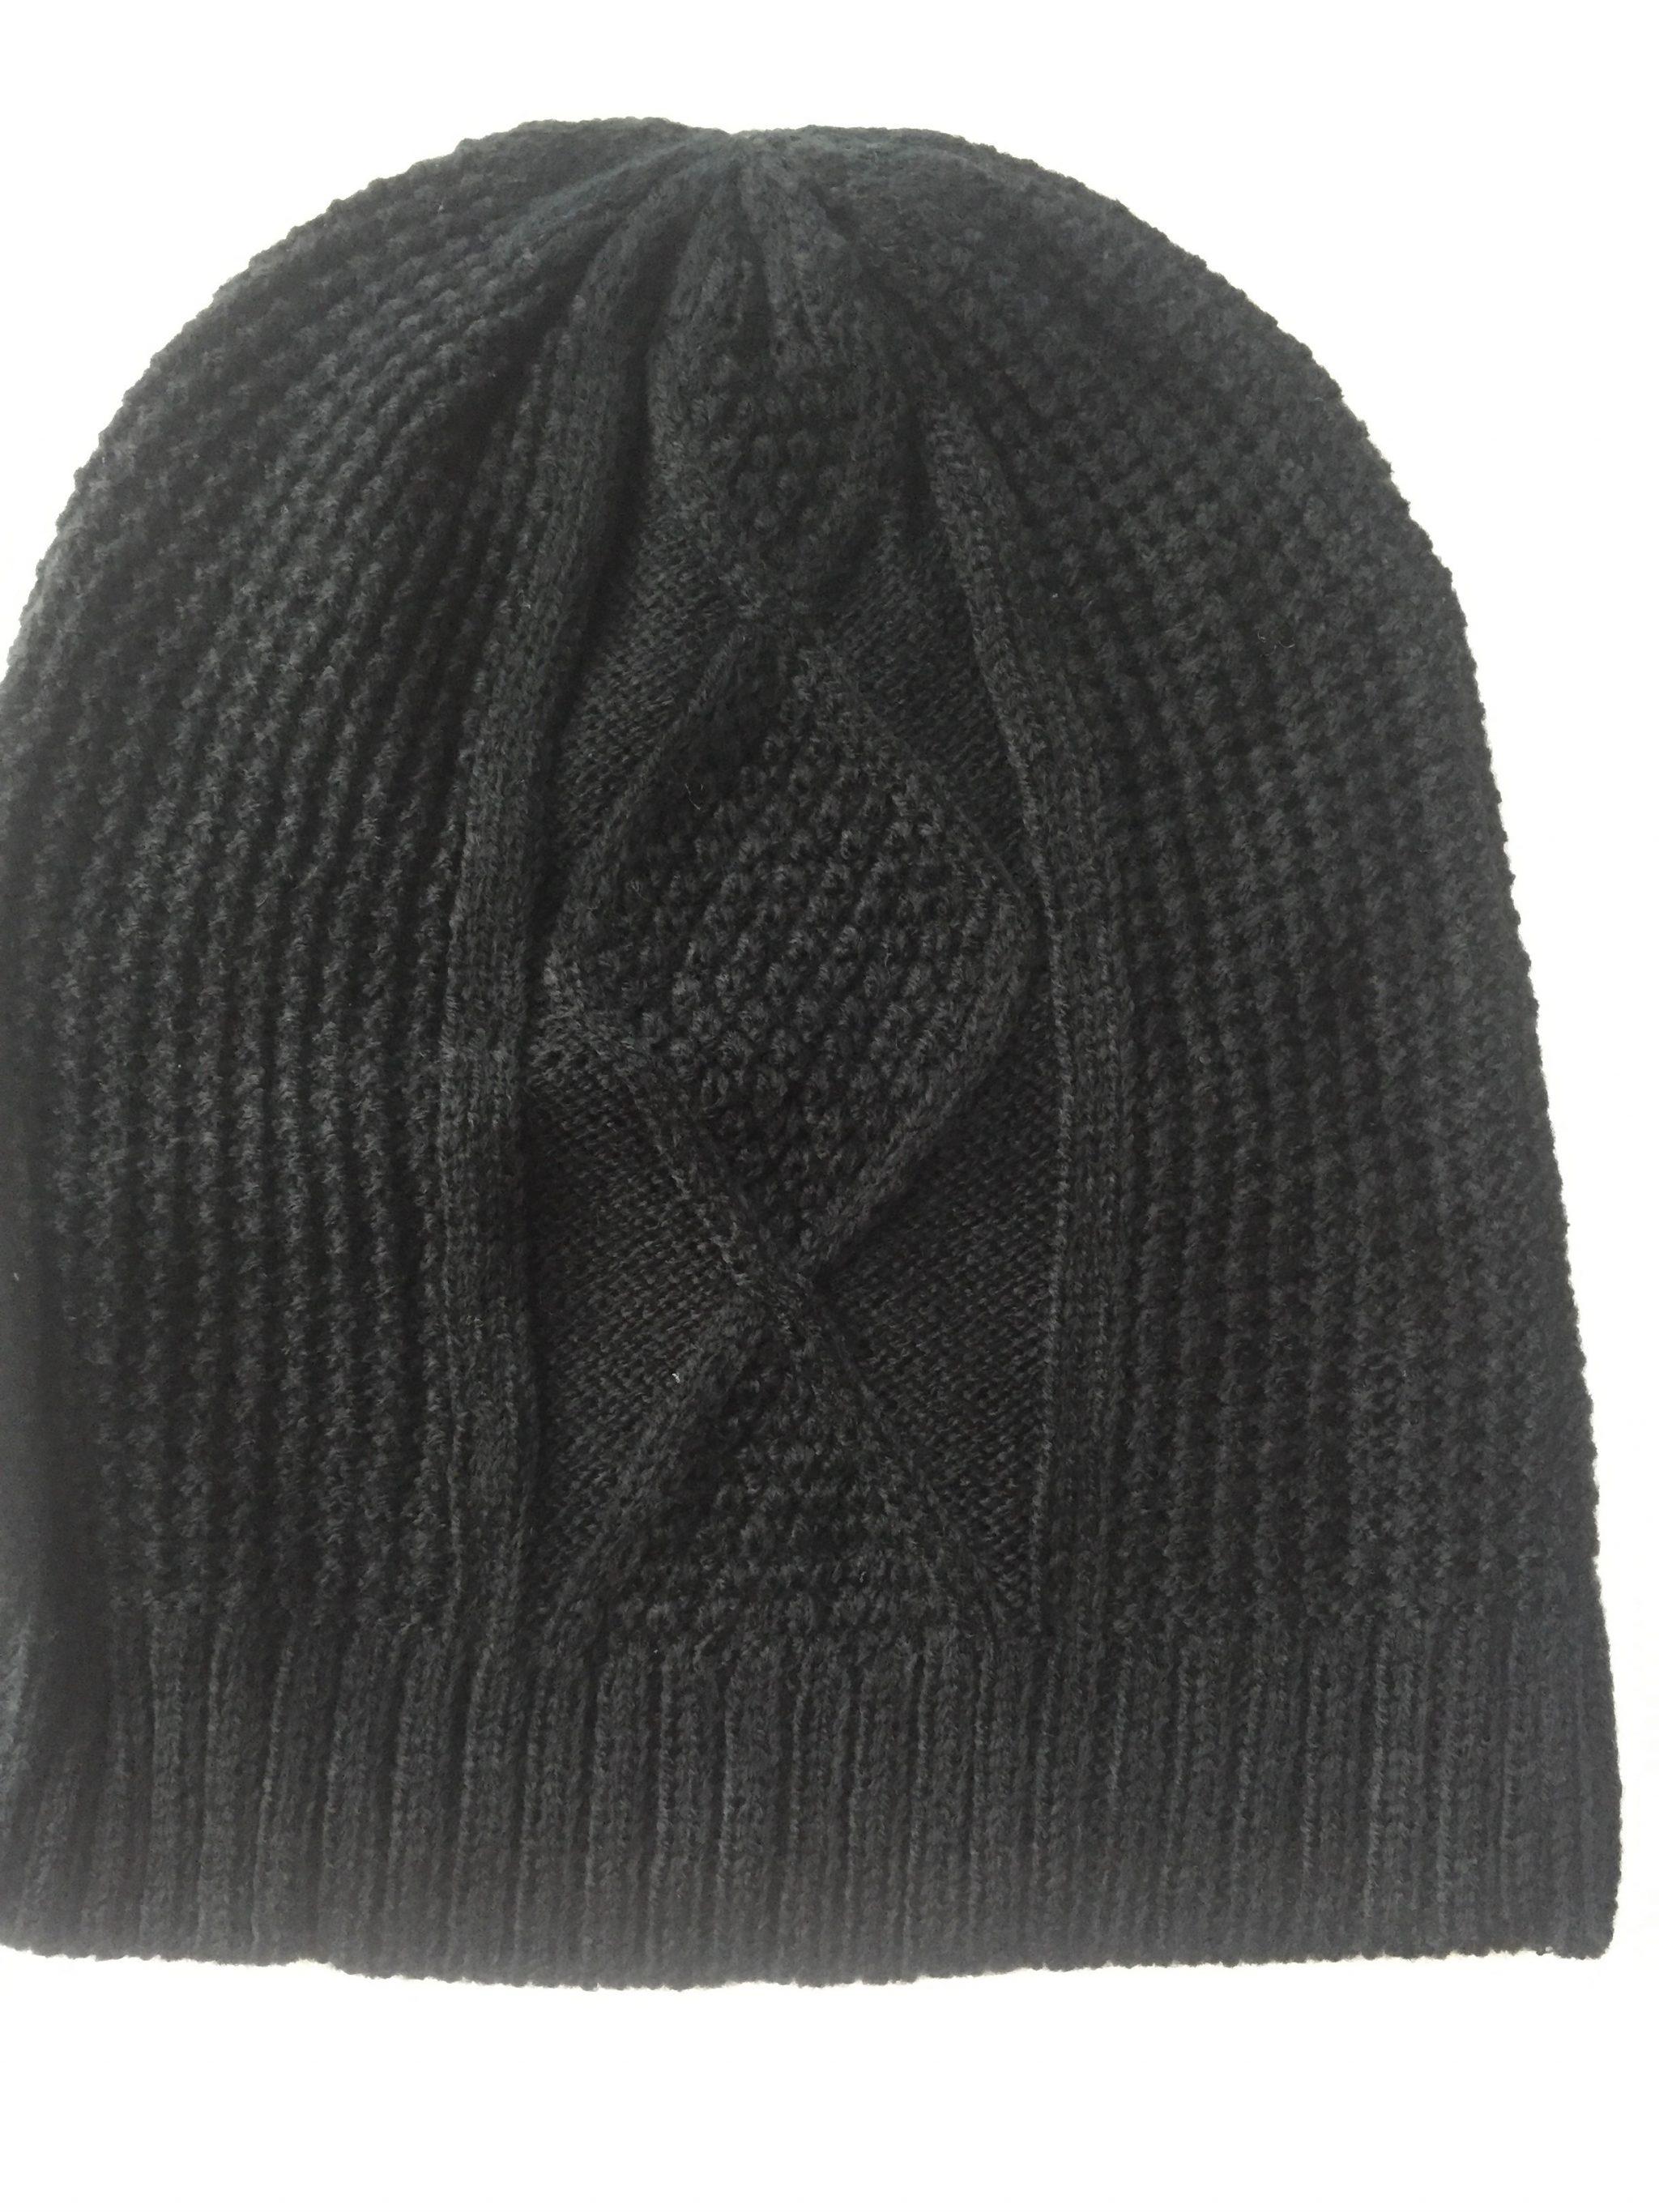 FabFitFun Fall 2017 black cable knit toque